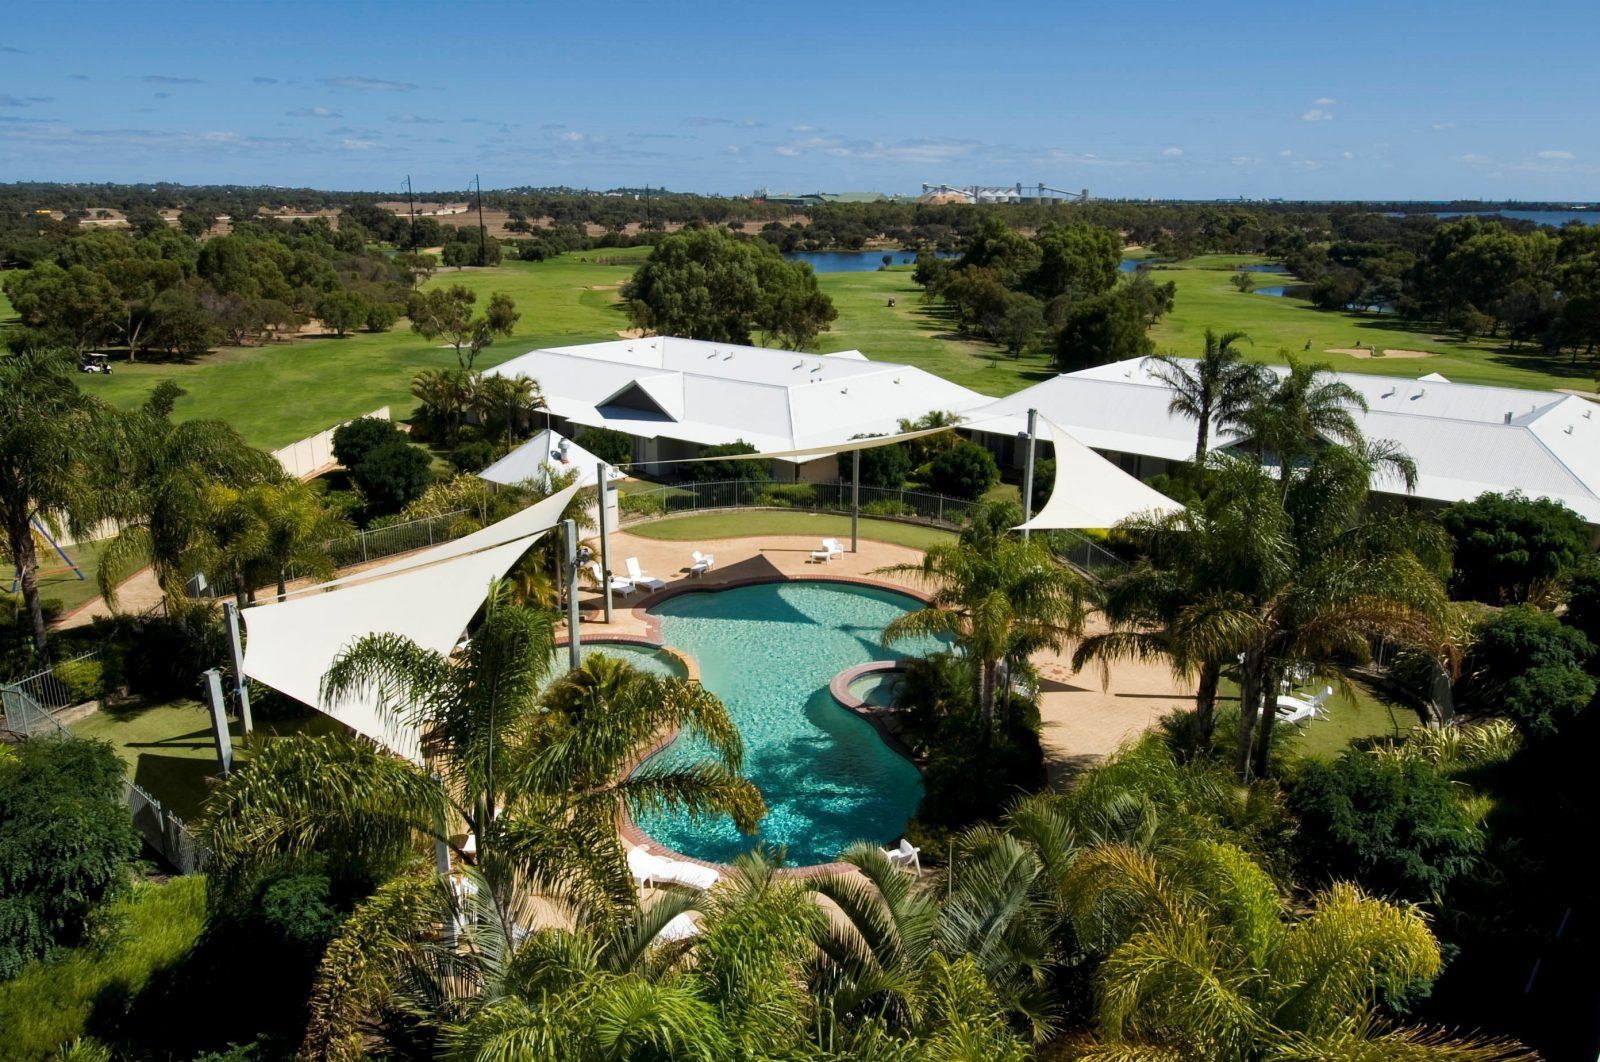 Mercure Sanctuary Golf Resort, Pelican Point, Western Australia